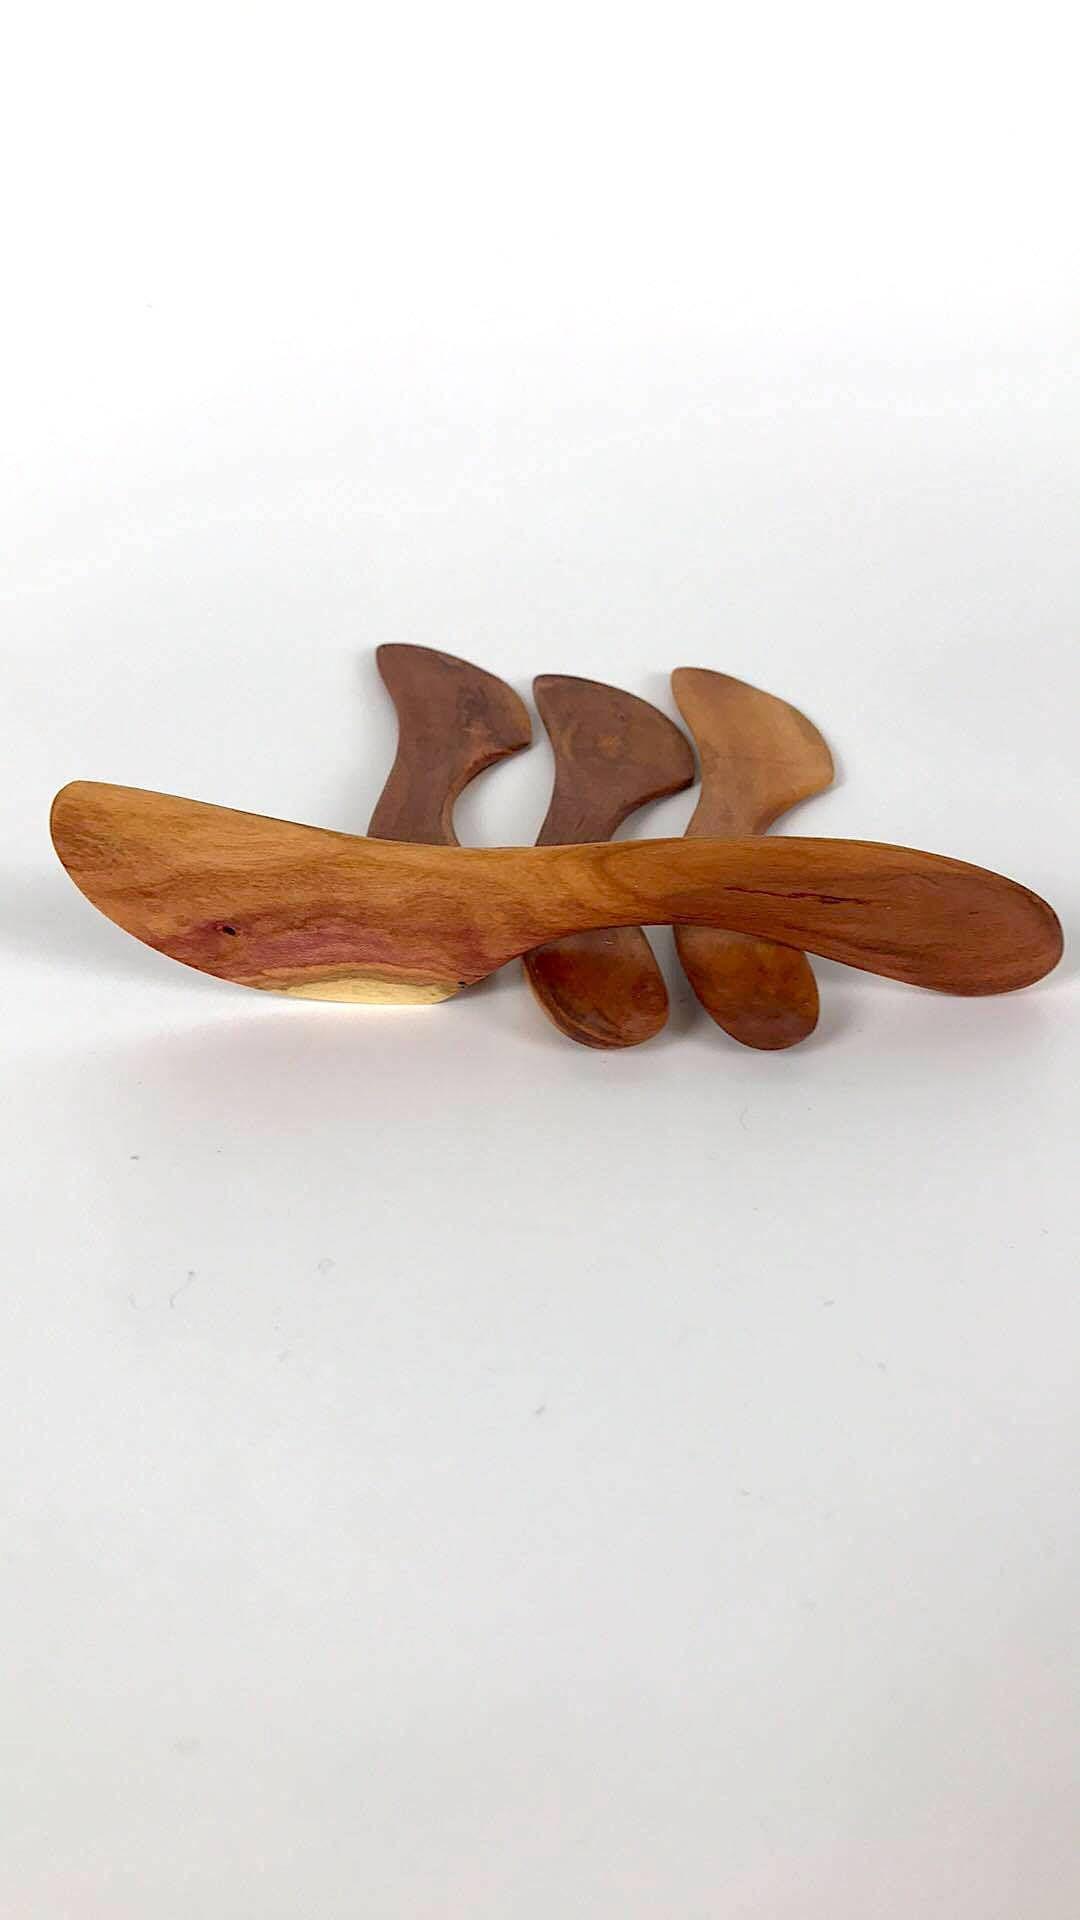 Wooden spreading knife wood butter knife handmade knife